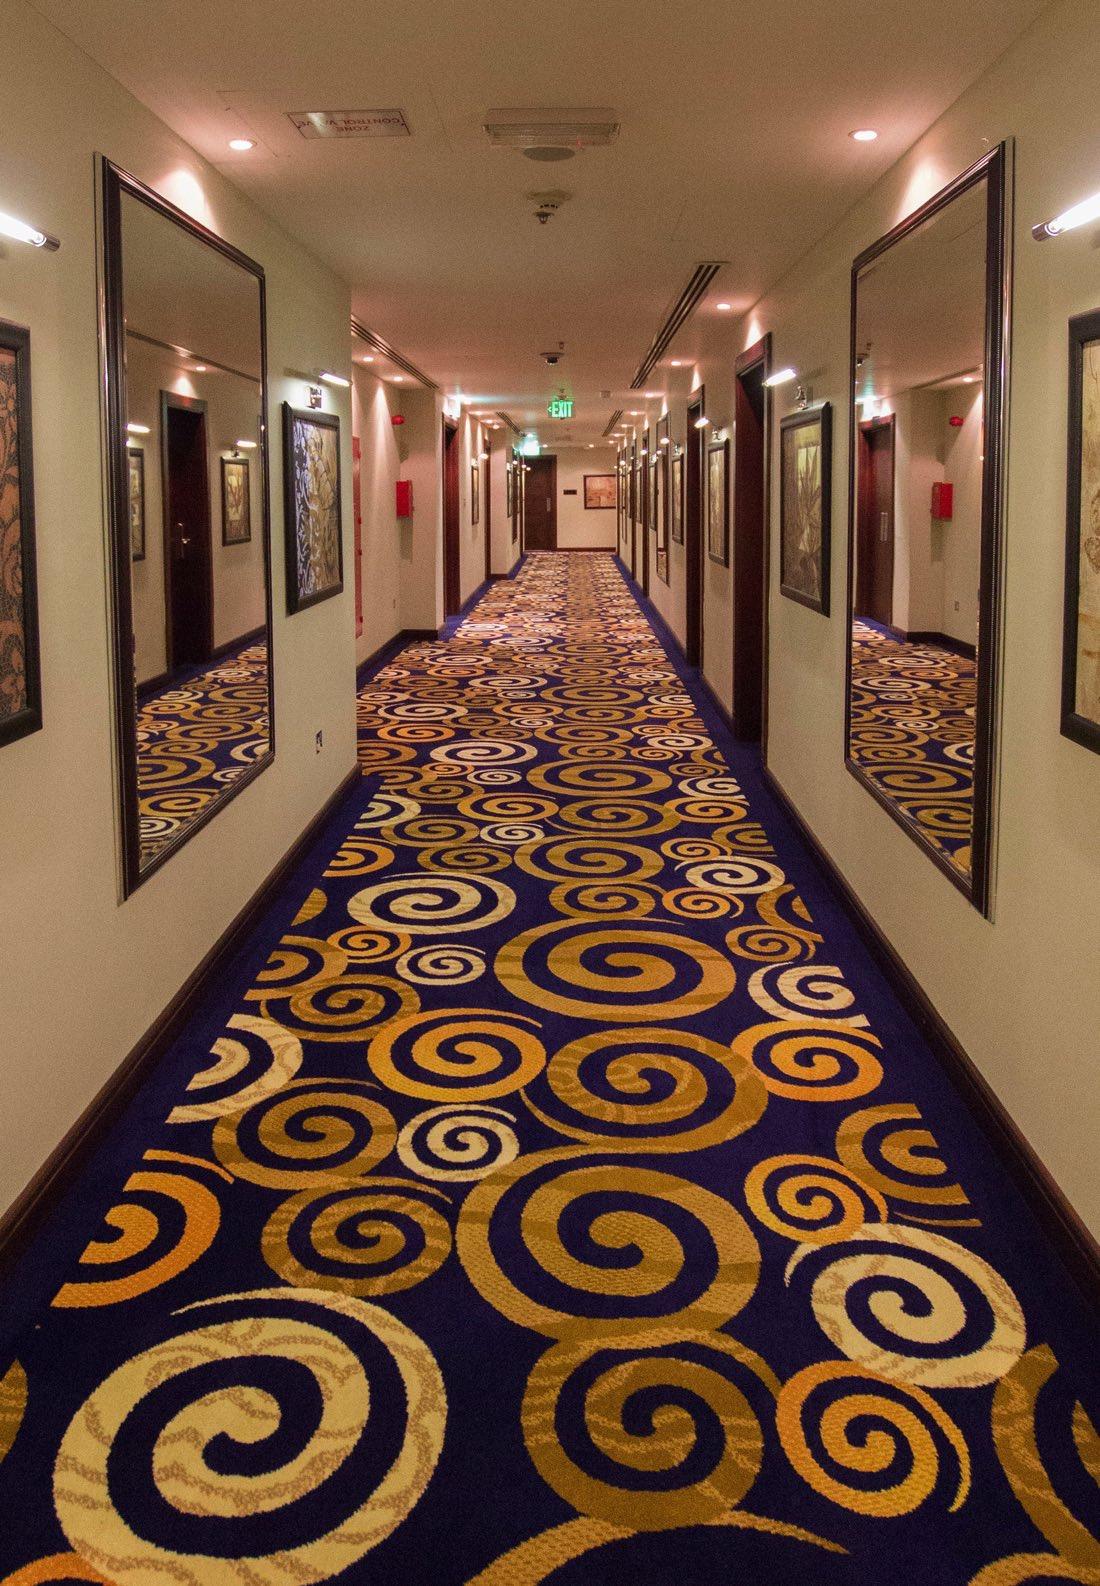 Strato Hotel by Warwick Hallway (vertical)